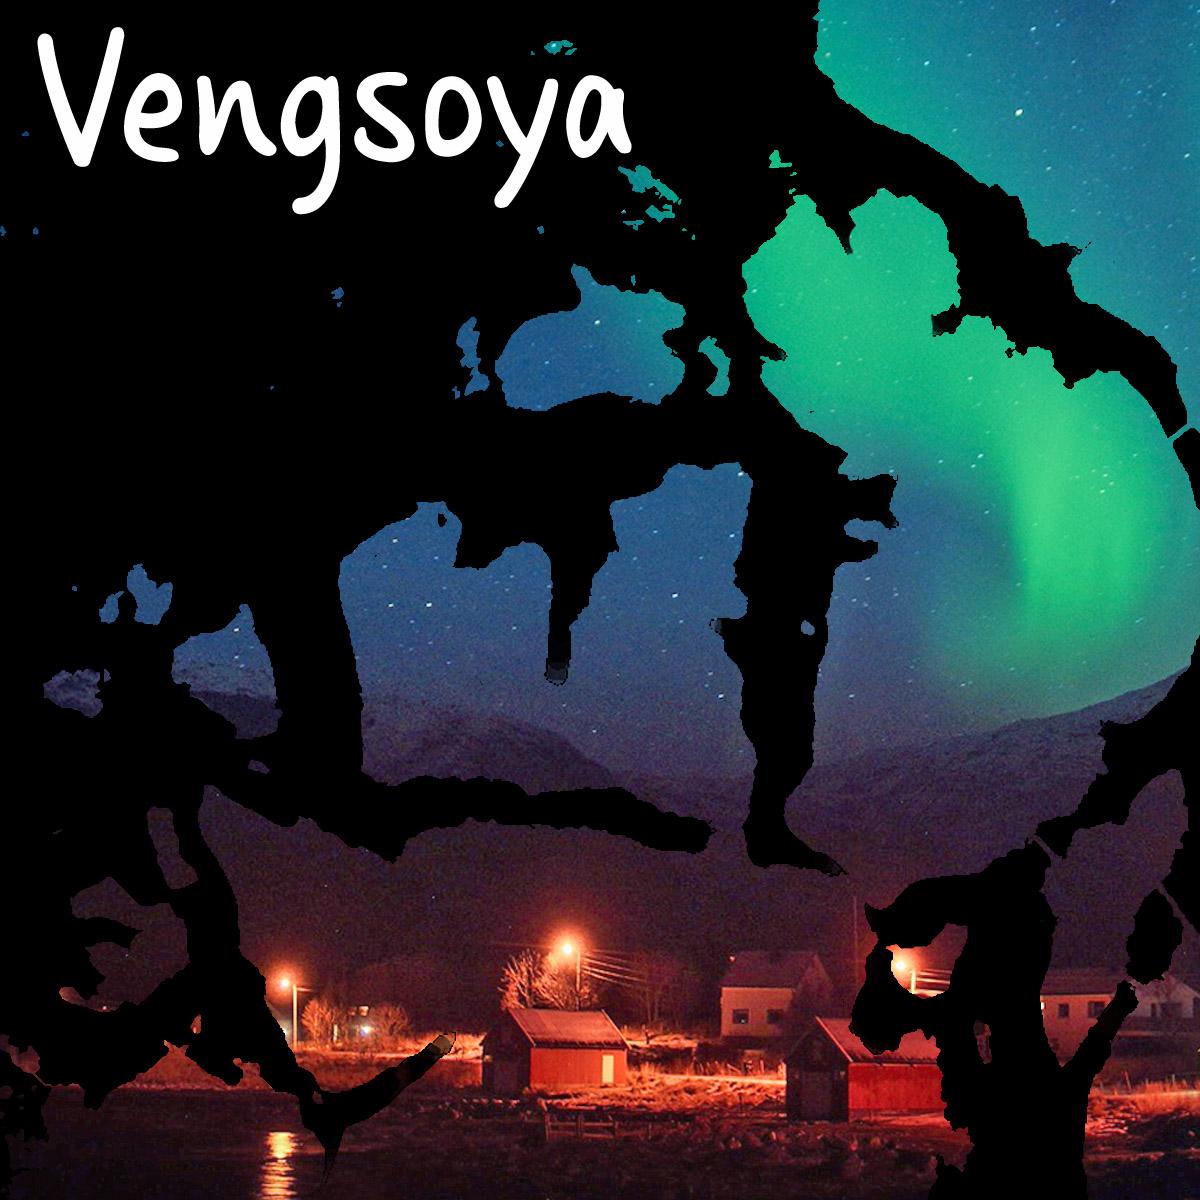 Vengsoya 2